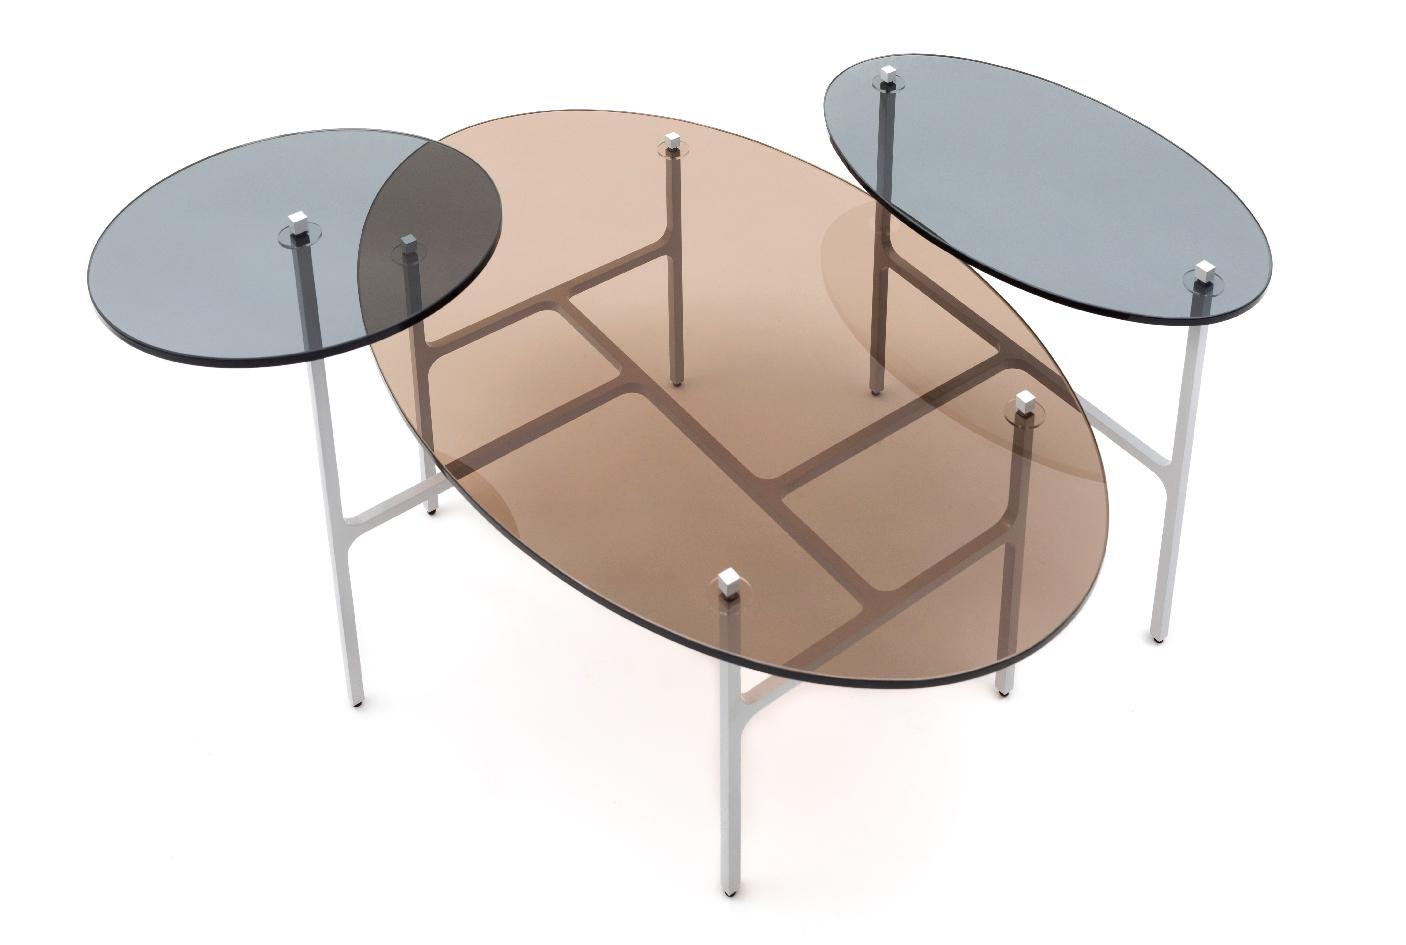 Luna Nesting Table_Comp5-01.jpg